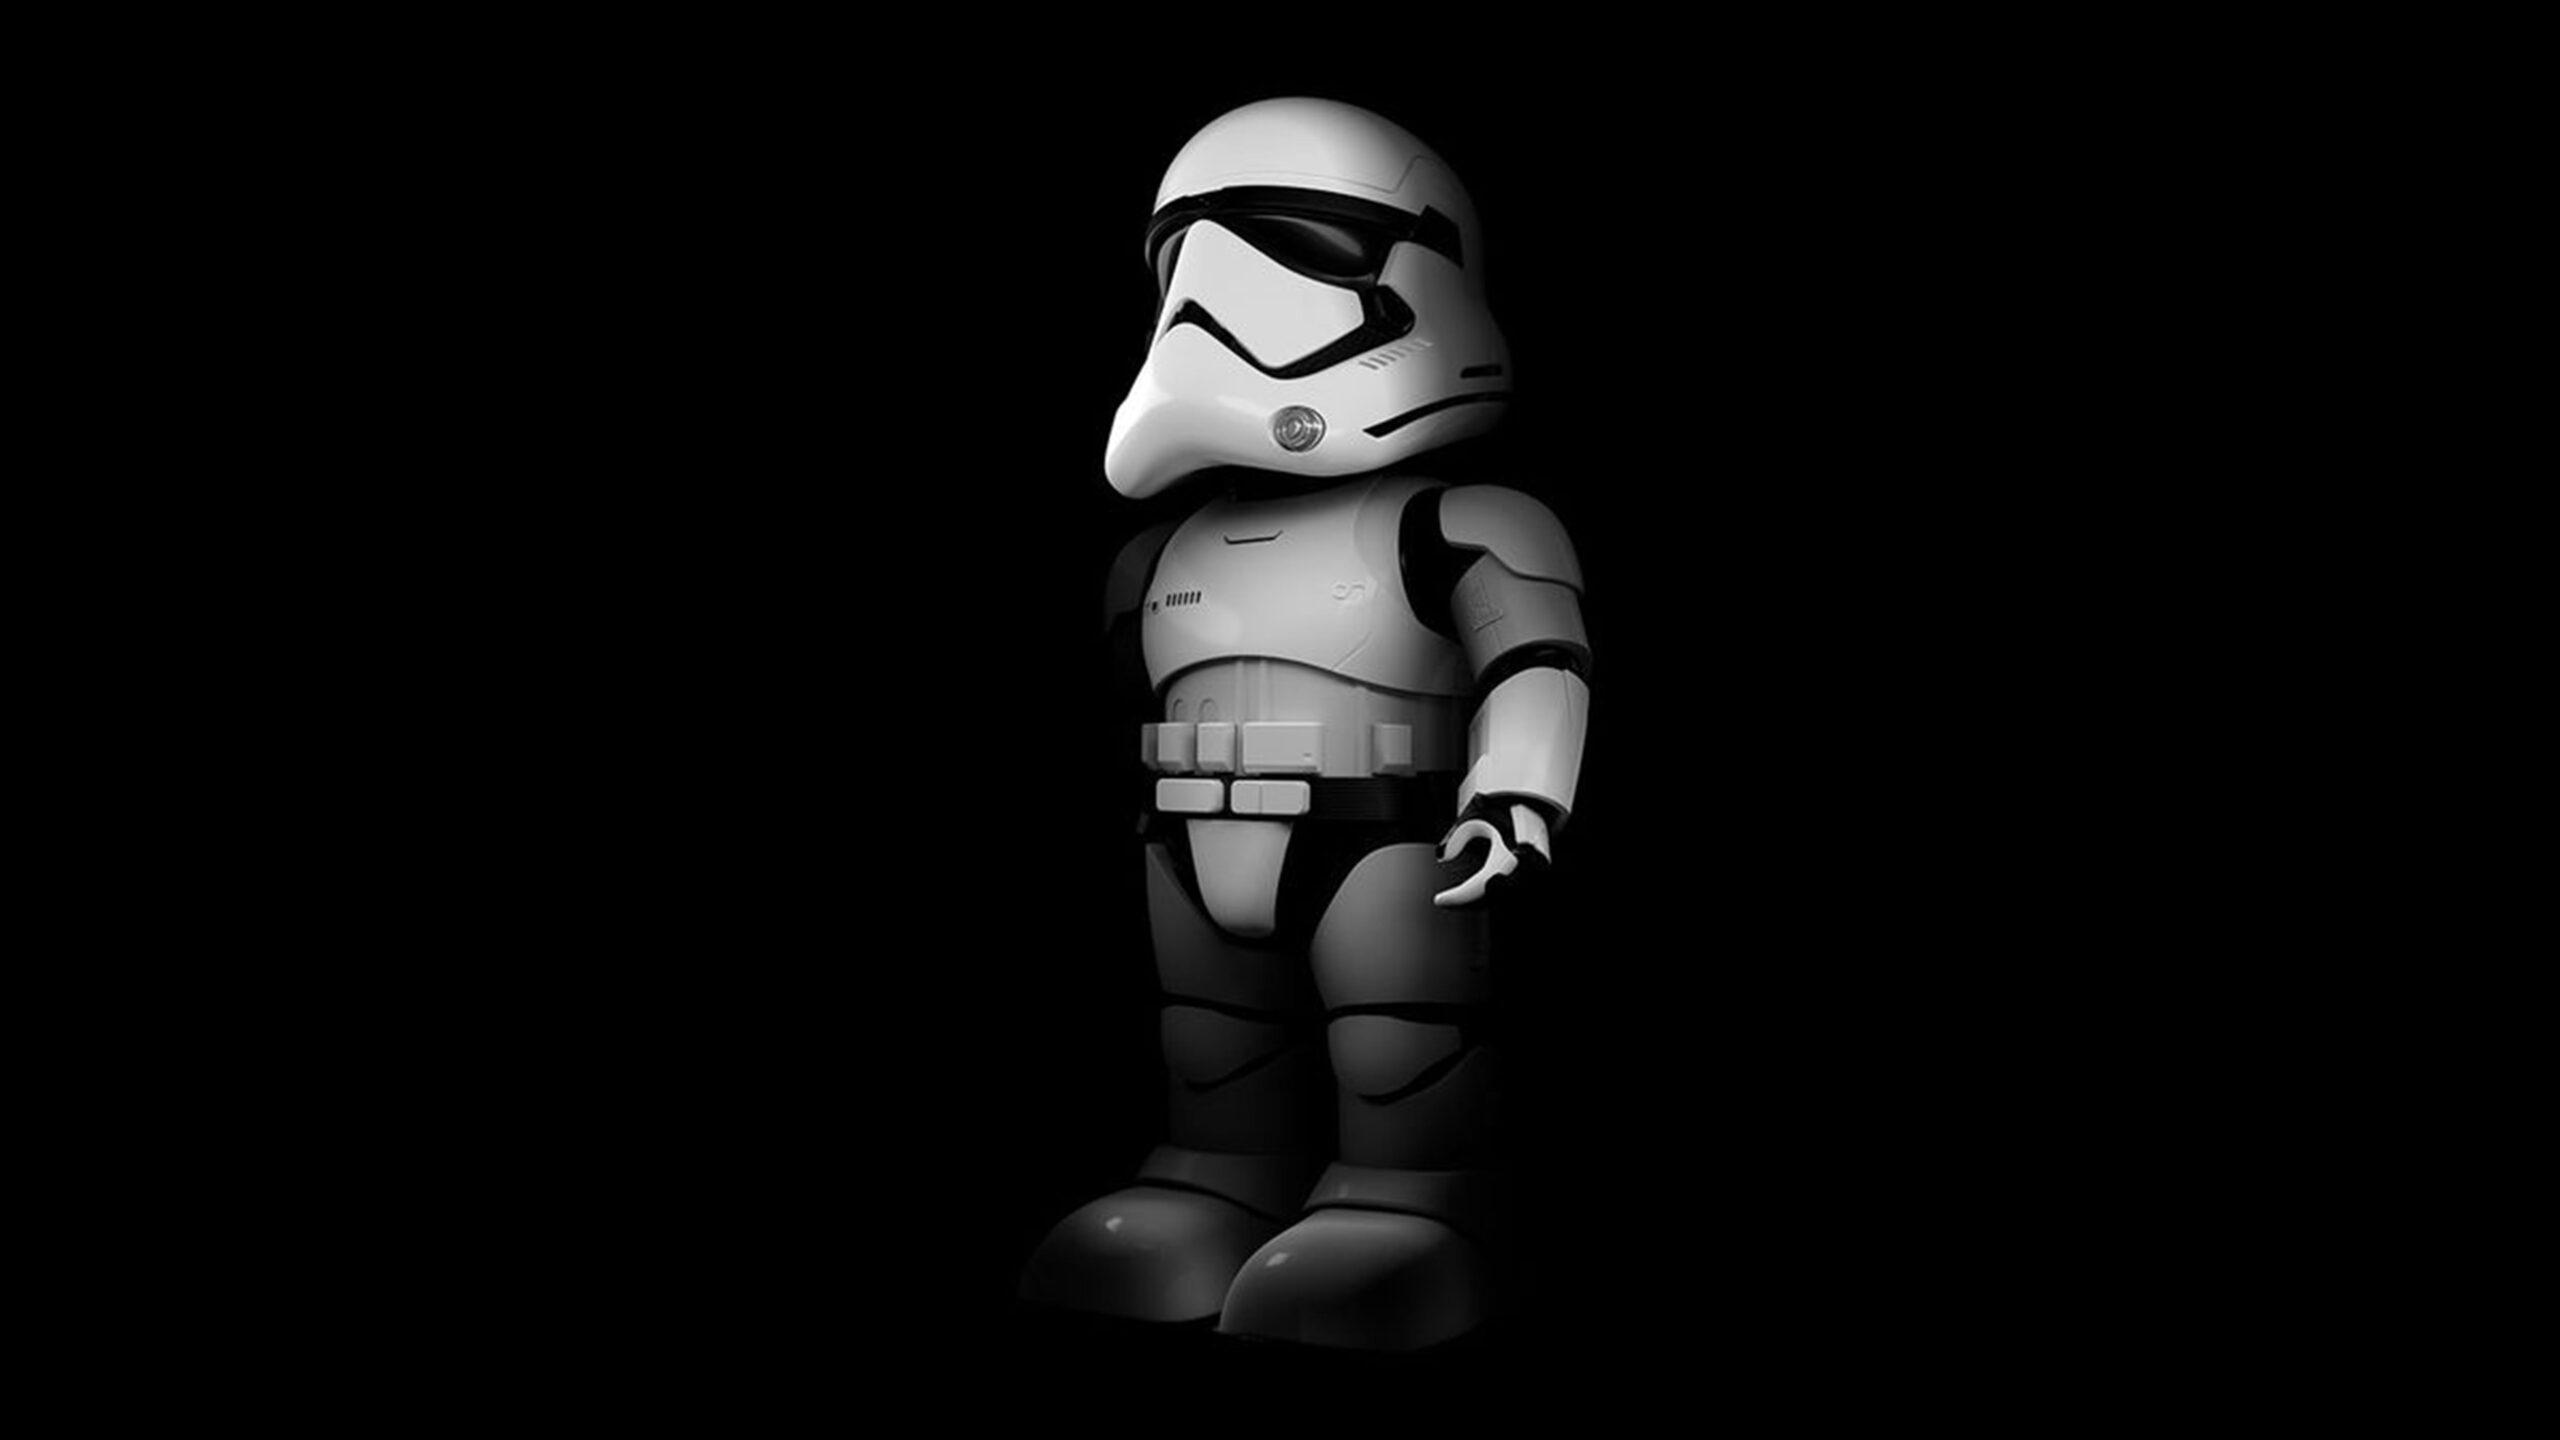 ¿Quieres tener tu propio Stormtrooper?